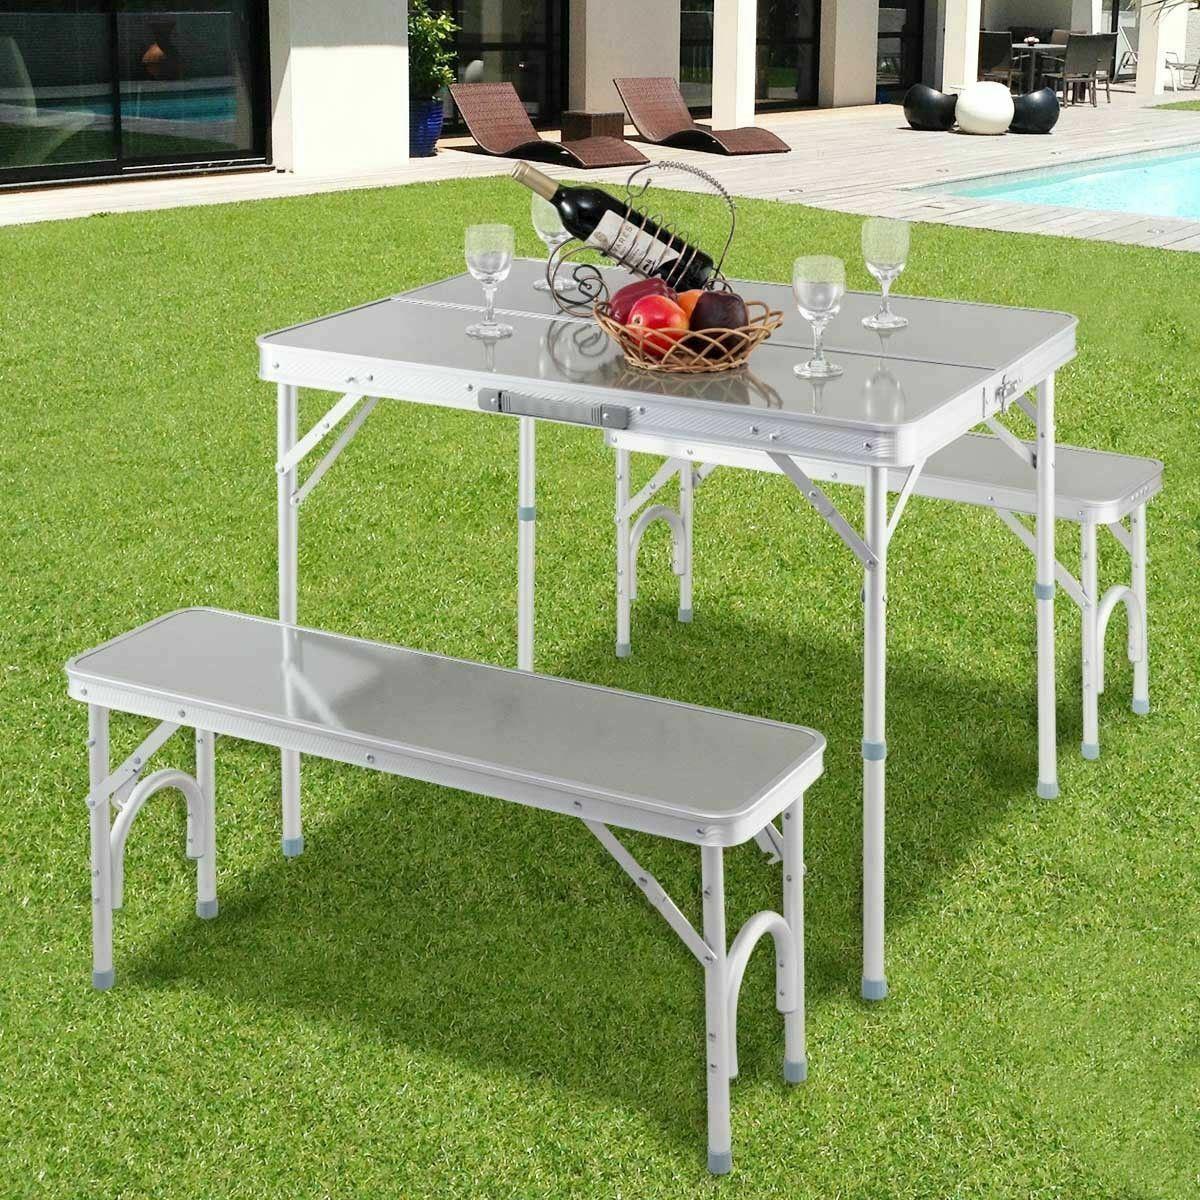 Durable Aluminum Portable Folding Picnic Table w/2 Benches - Outdoor Rec.